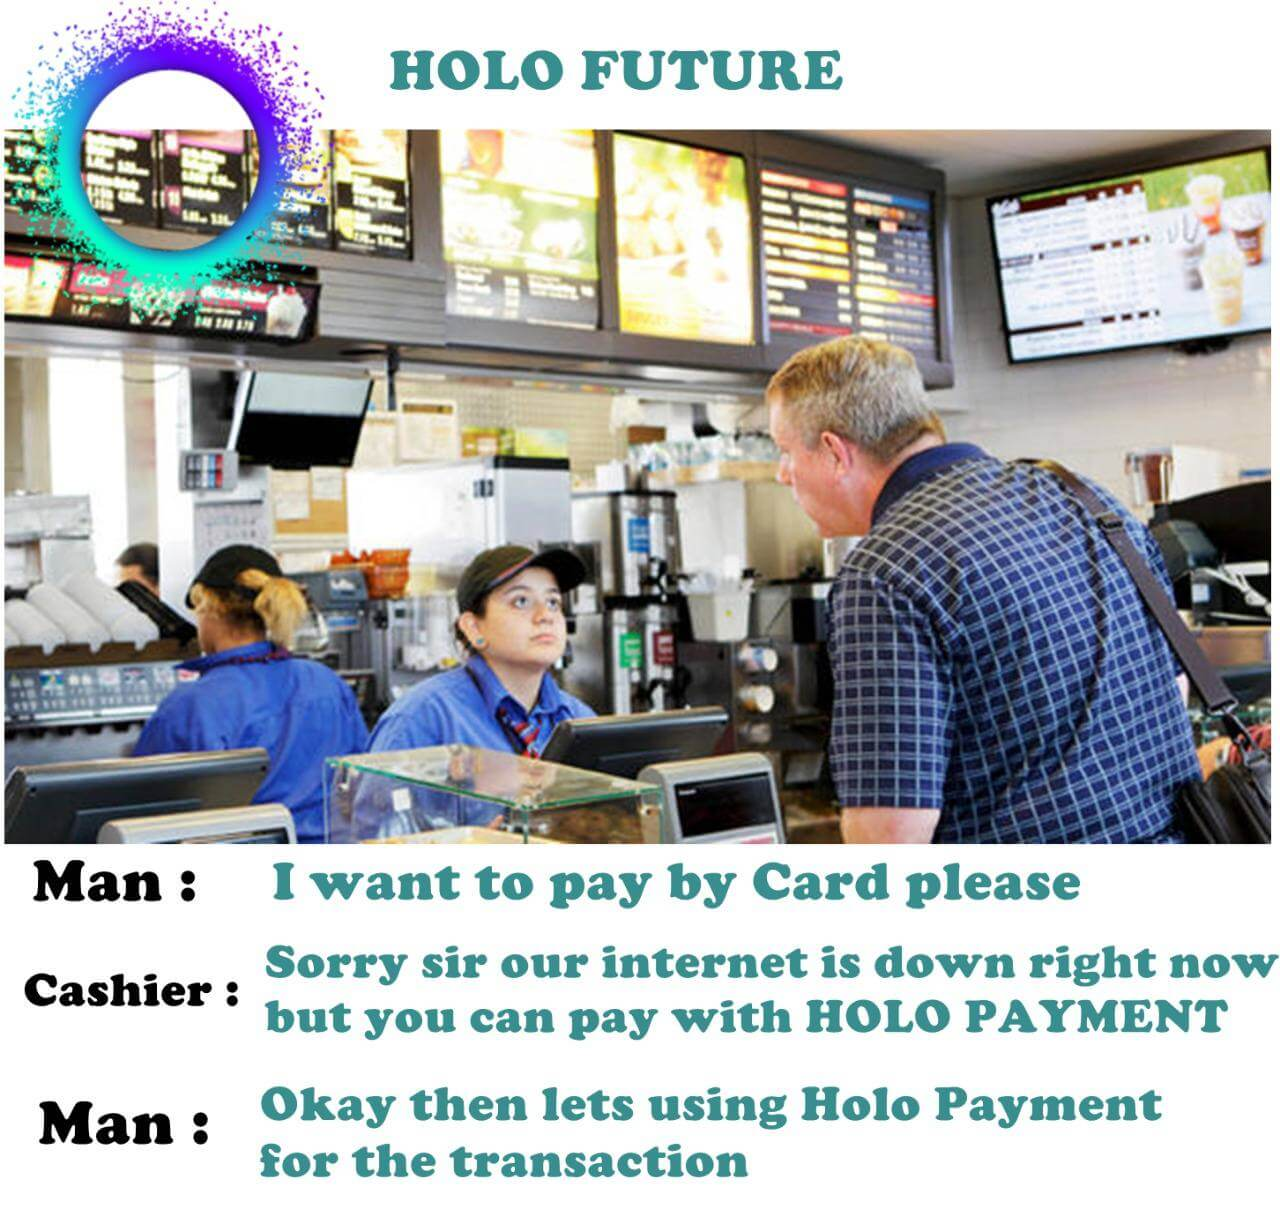 HoloFuel McDonalds meme